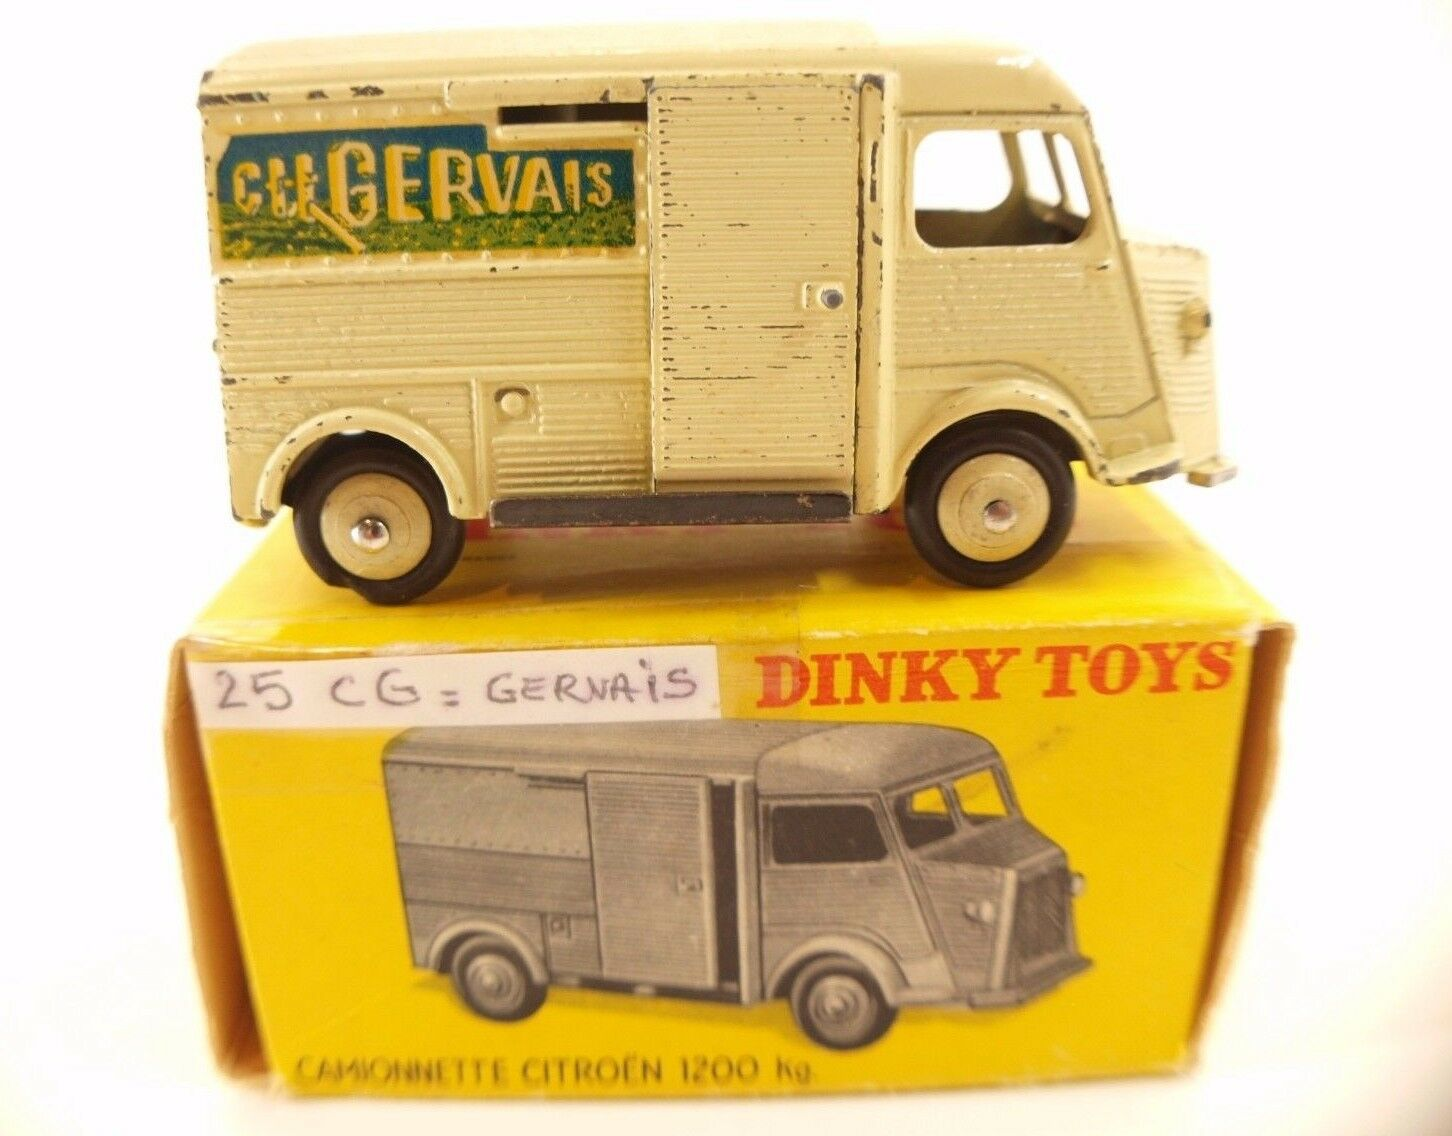 Dinky Toys F n° 25CG Citroën Charles Gervais 1200 Kg tube en boite